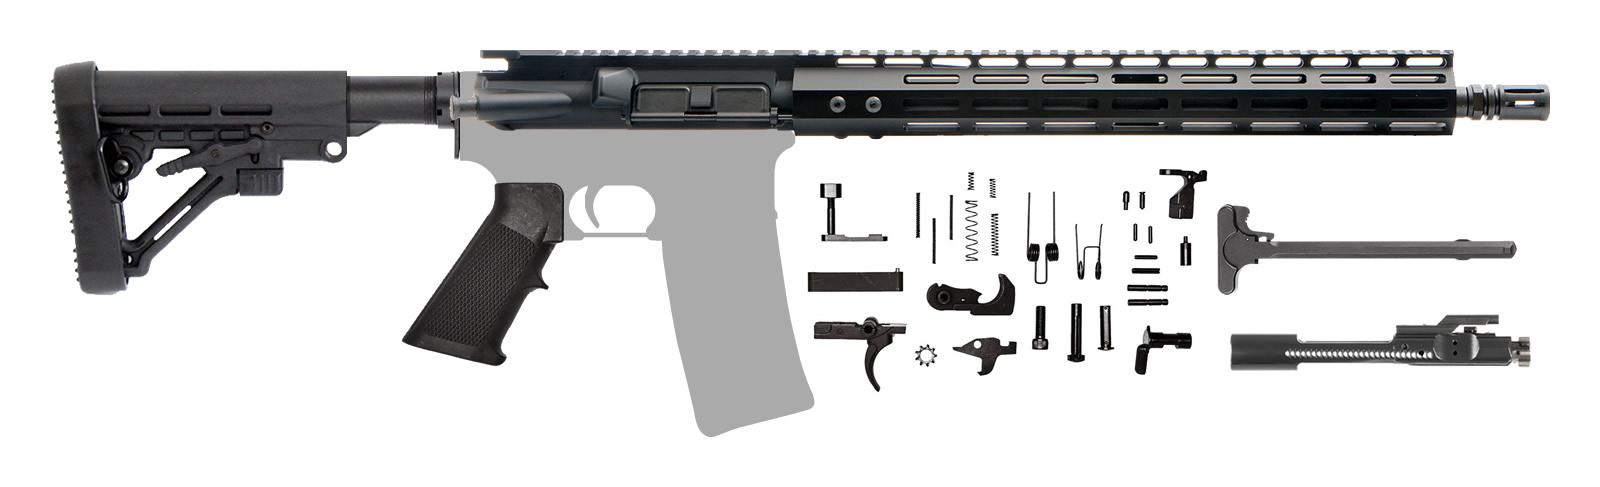 "CHS-2 Patrol AR-15 Rifle Kit 16"" with M-LOK Handguard & Adjustable Buttstock"